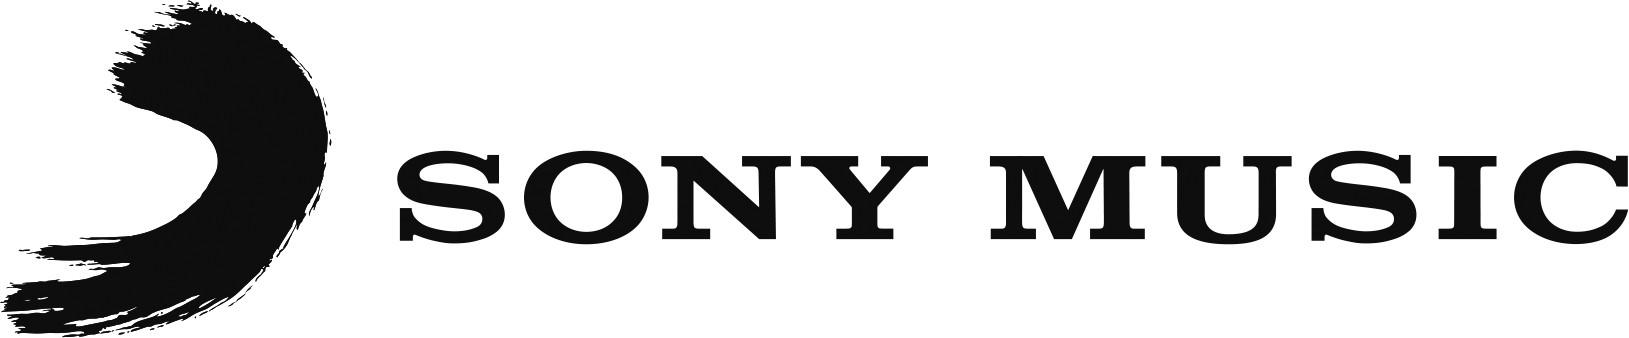 LOGO-Sony-Music-2.jpg